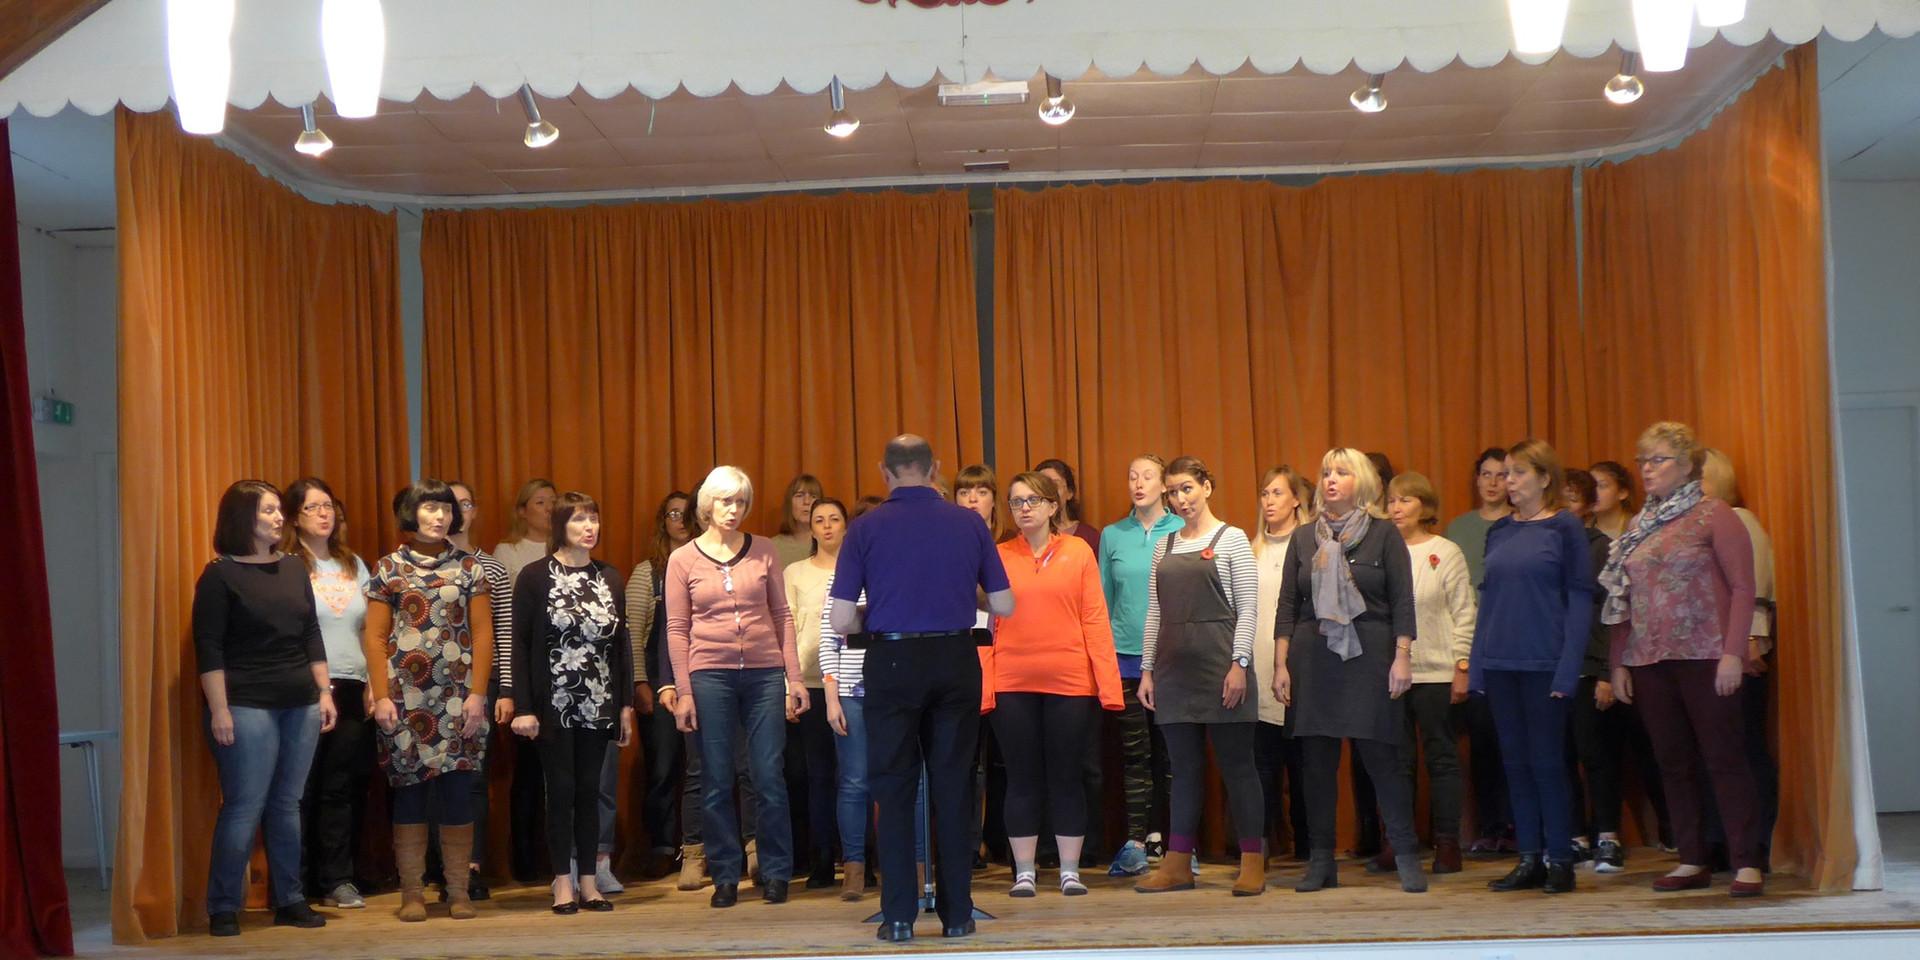 Llandudno rehearsal 2017